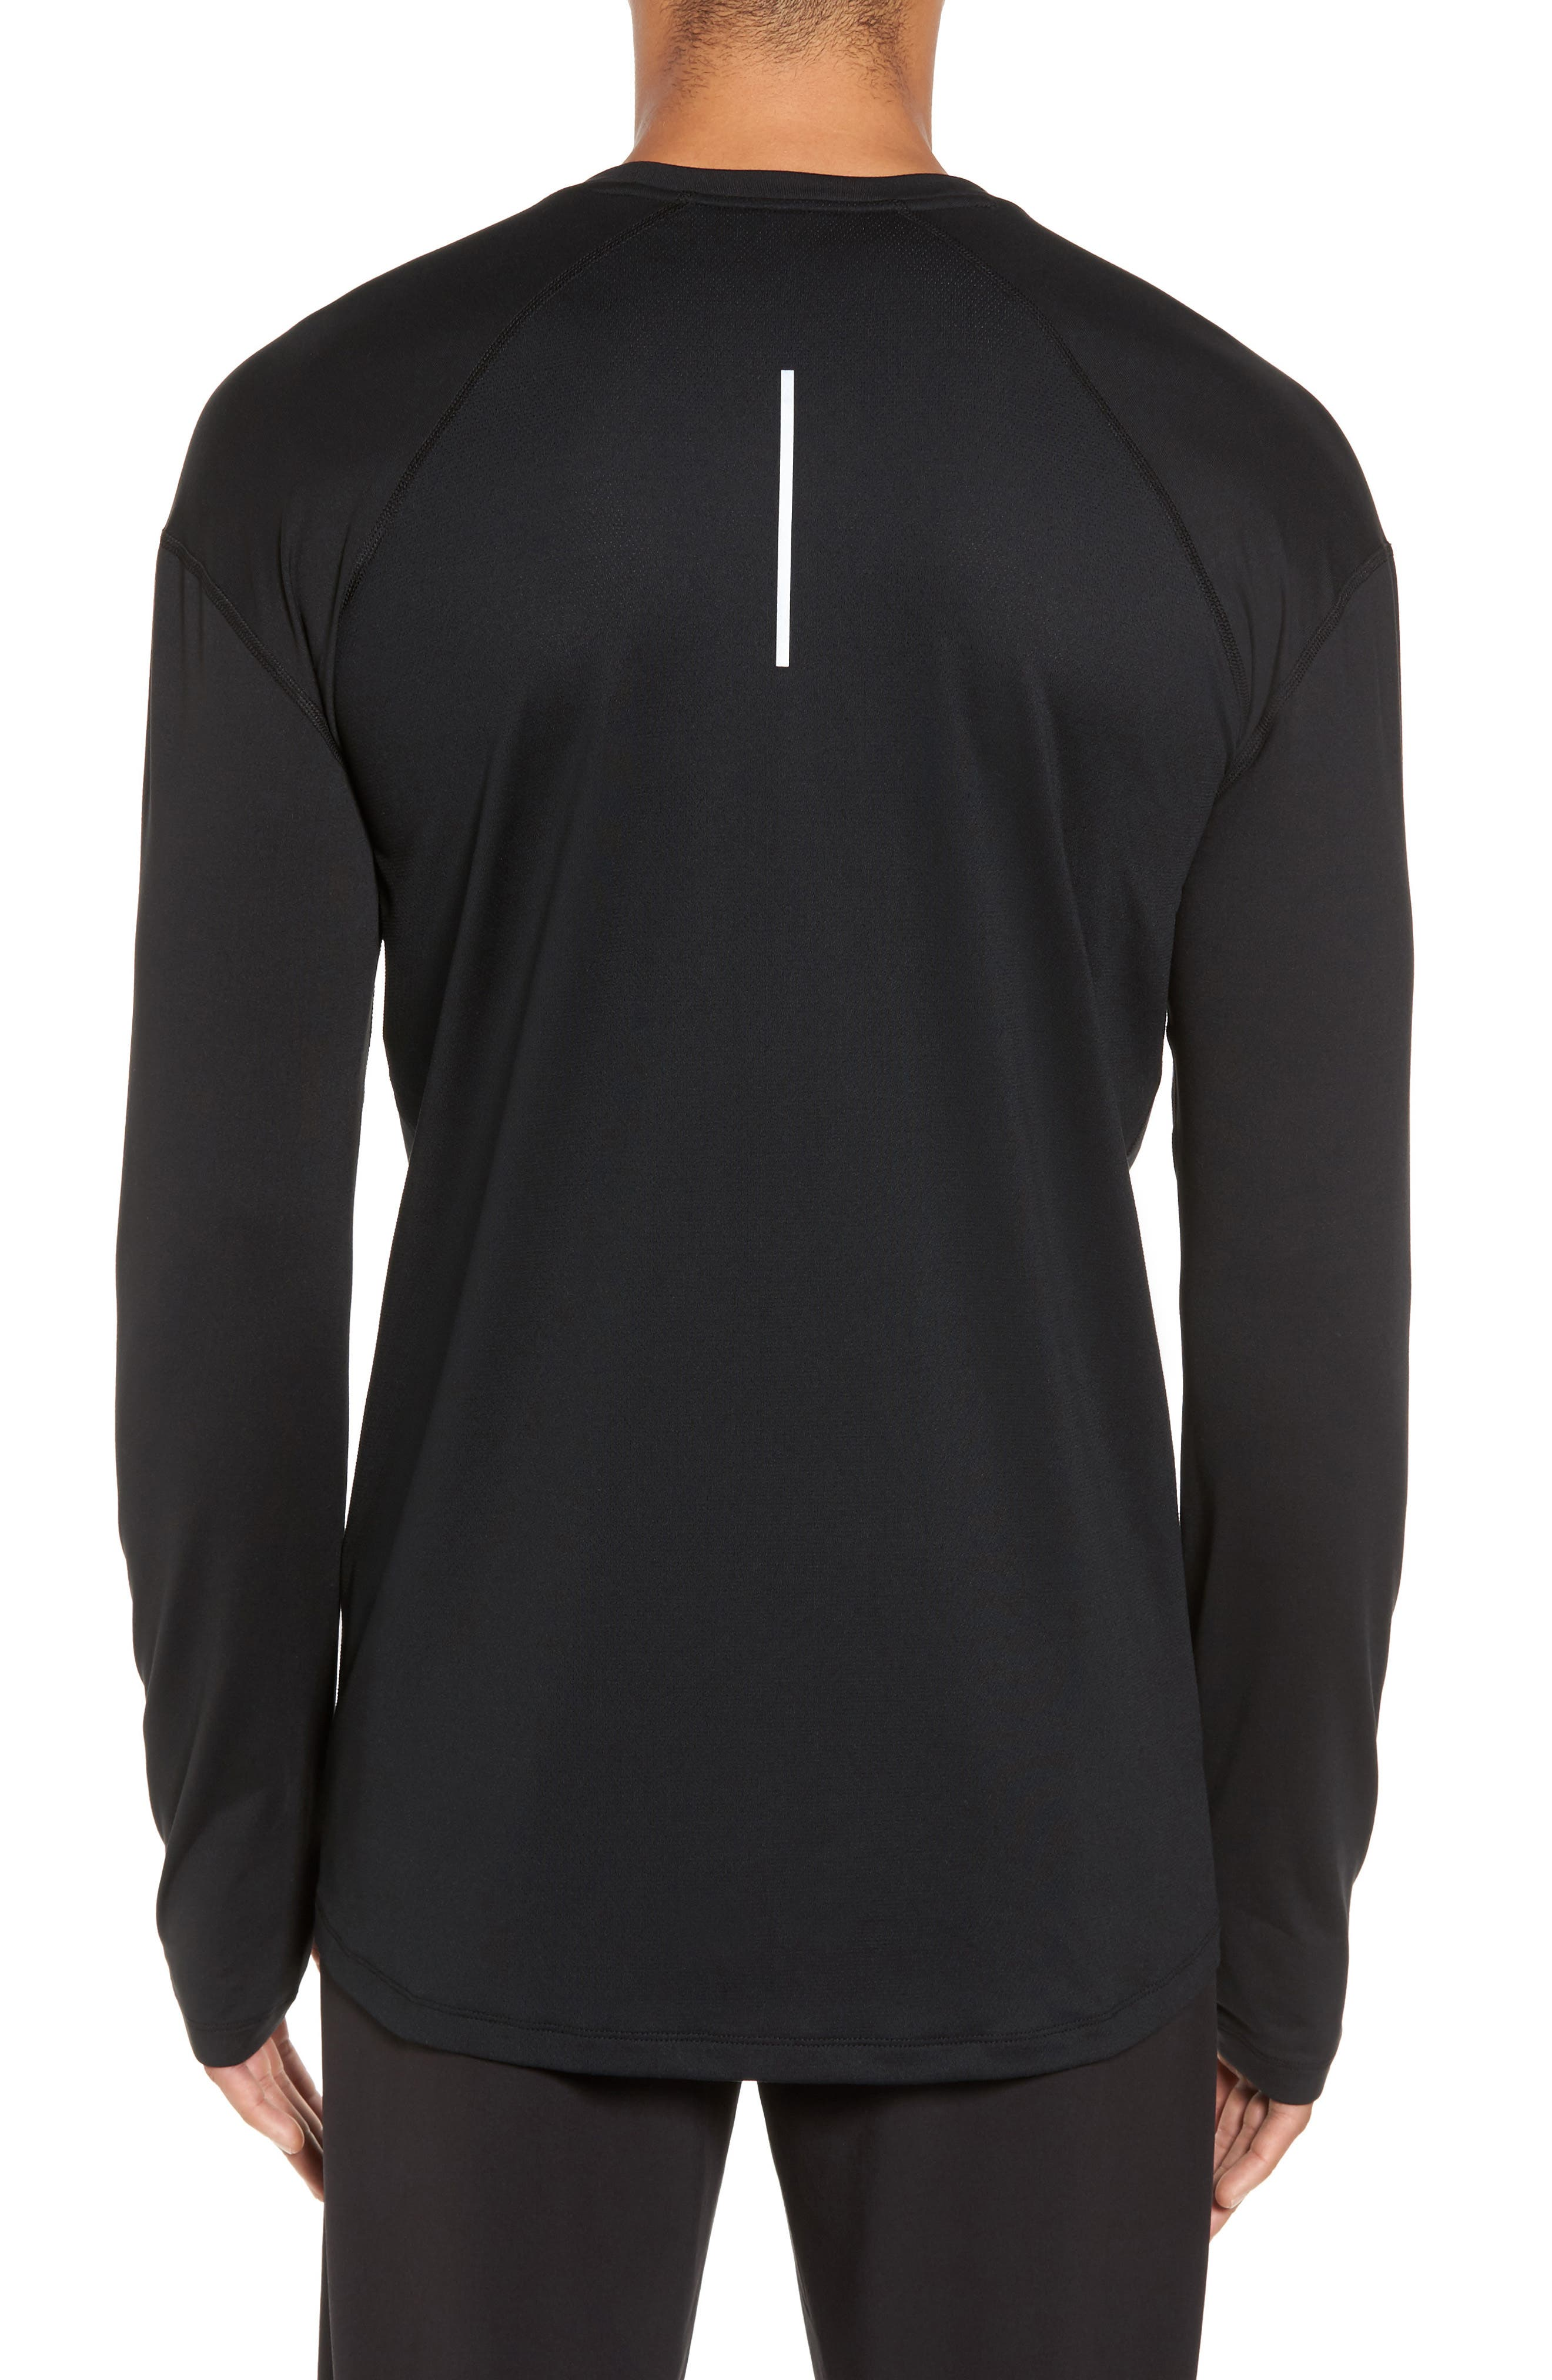 Running Dry Element Long Sleeve T-Shirt,                             Alternate thumbnail 2, color,                             Black